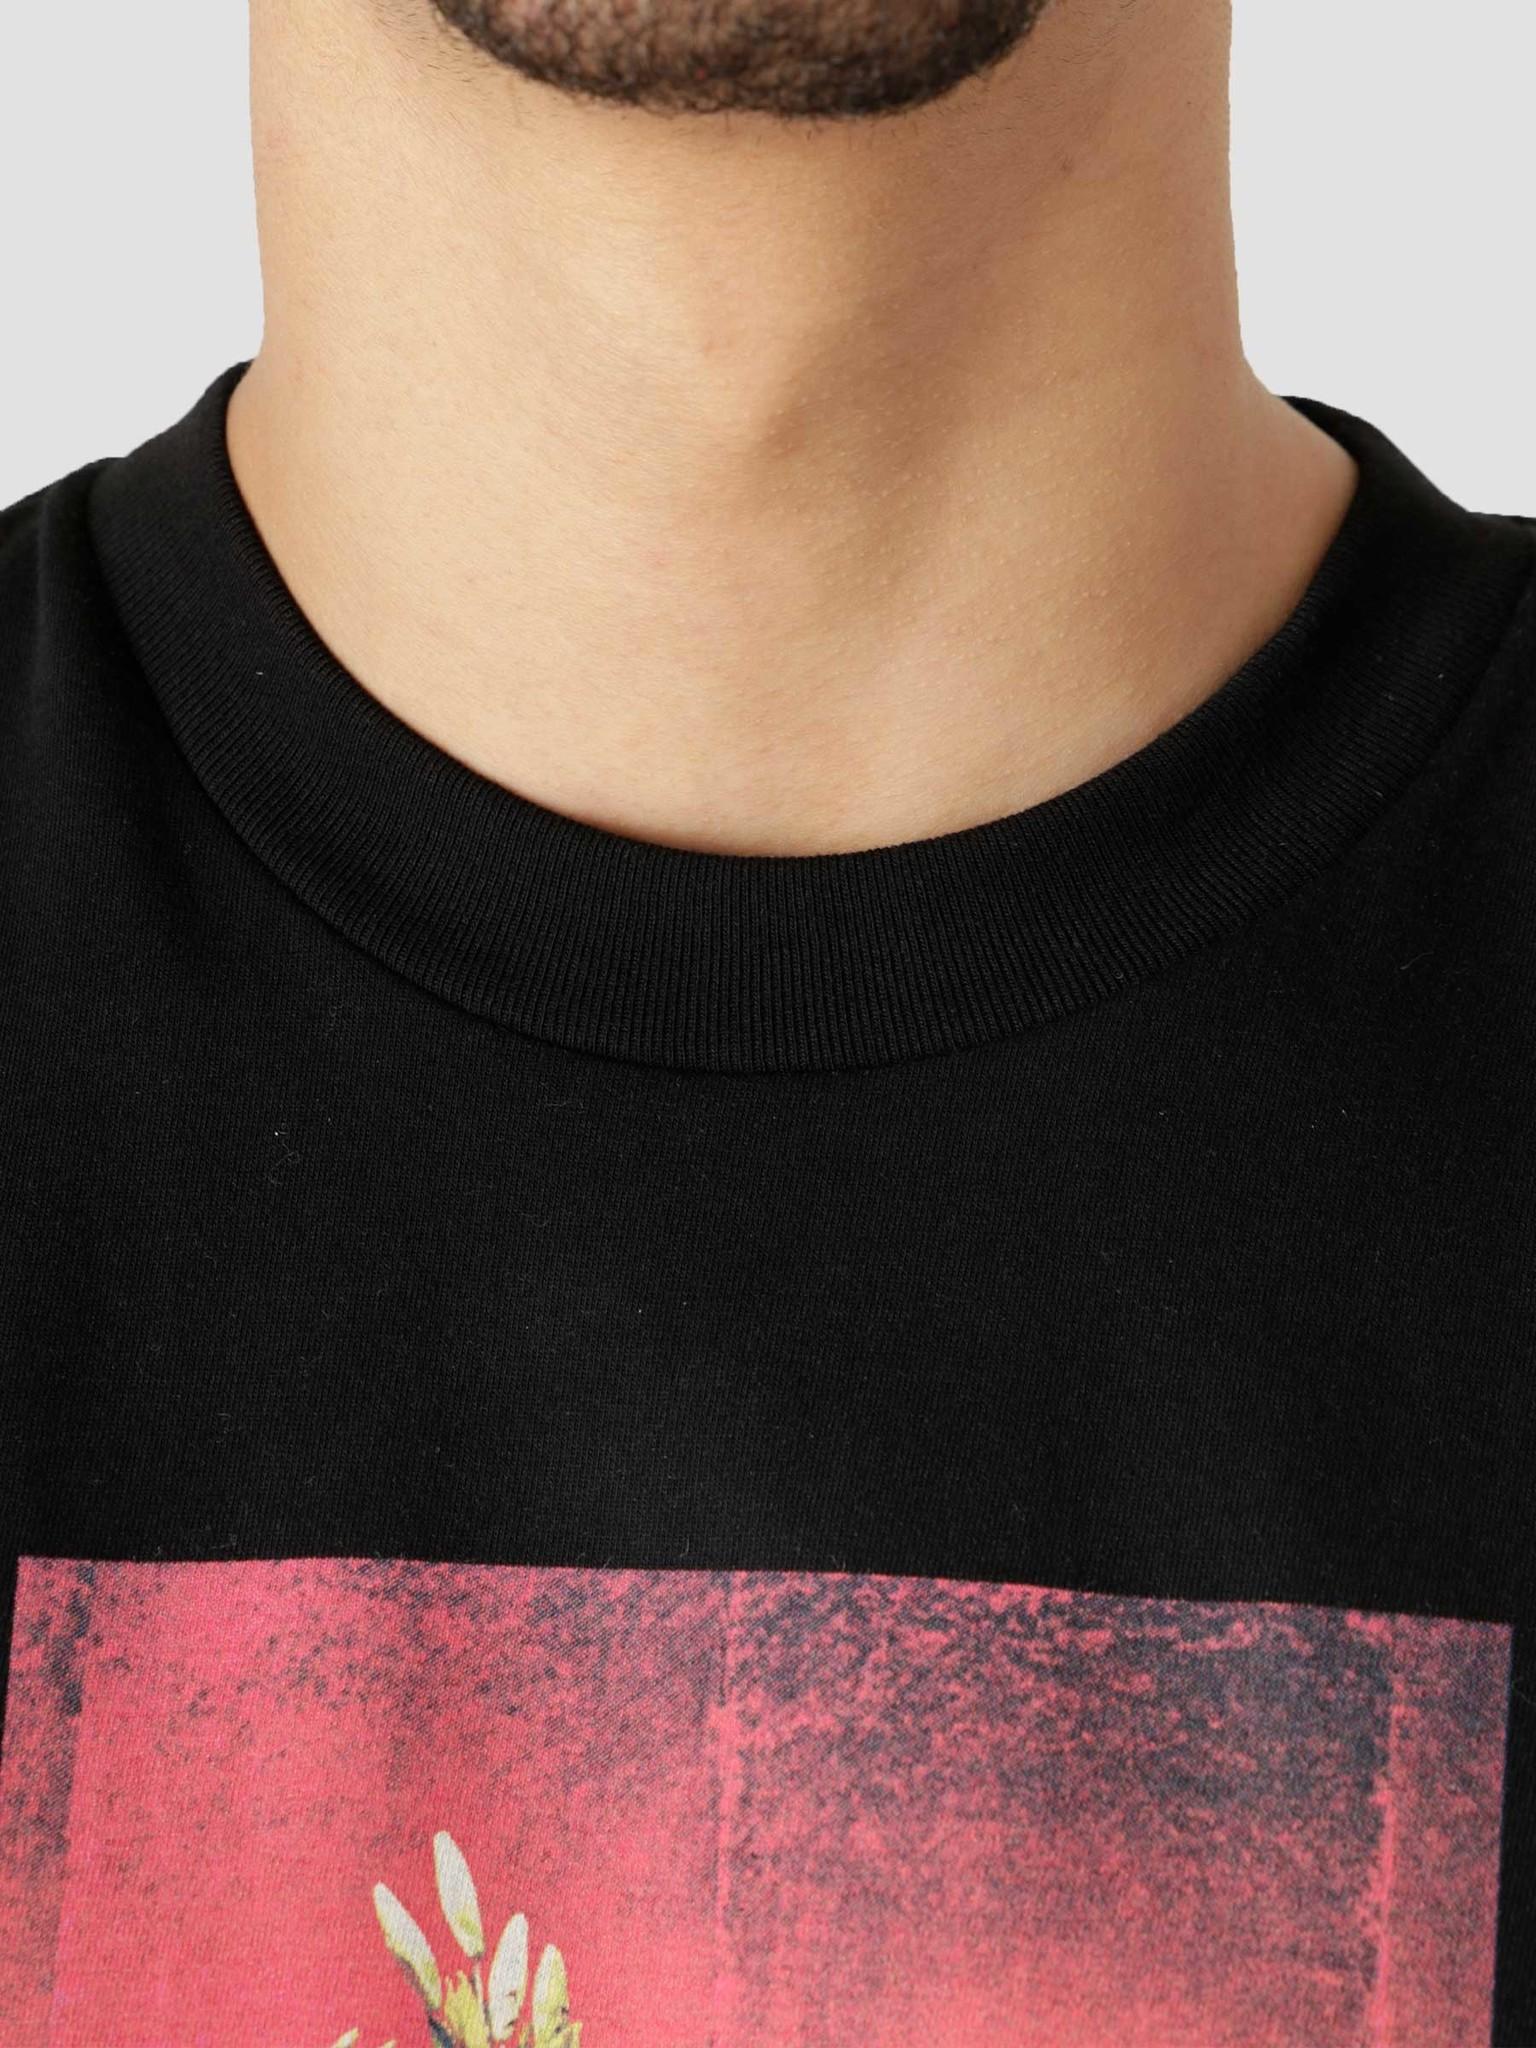 Carhartt WIP Carhartt WIP  Orbit Bouquet T-Shirt Black I029936